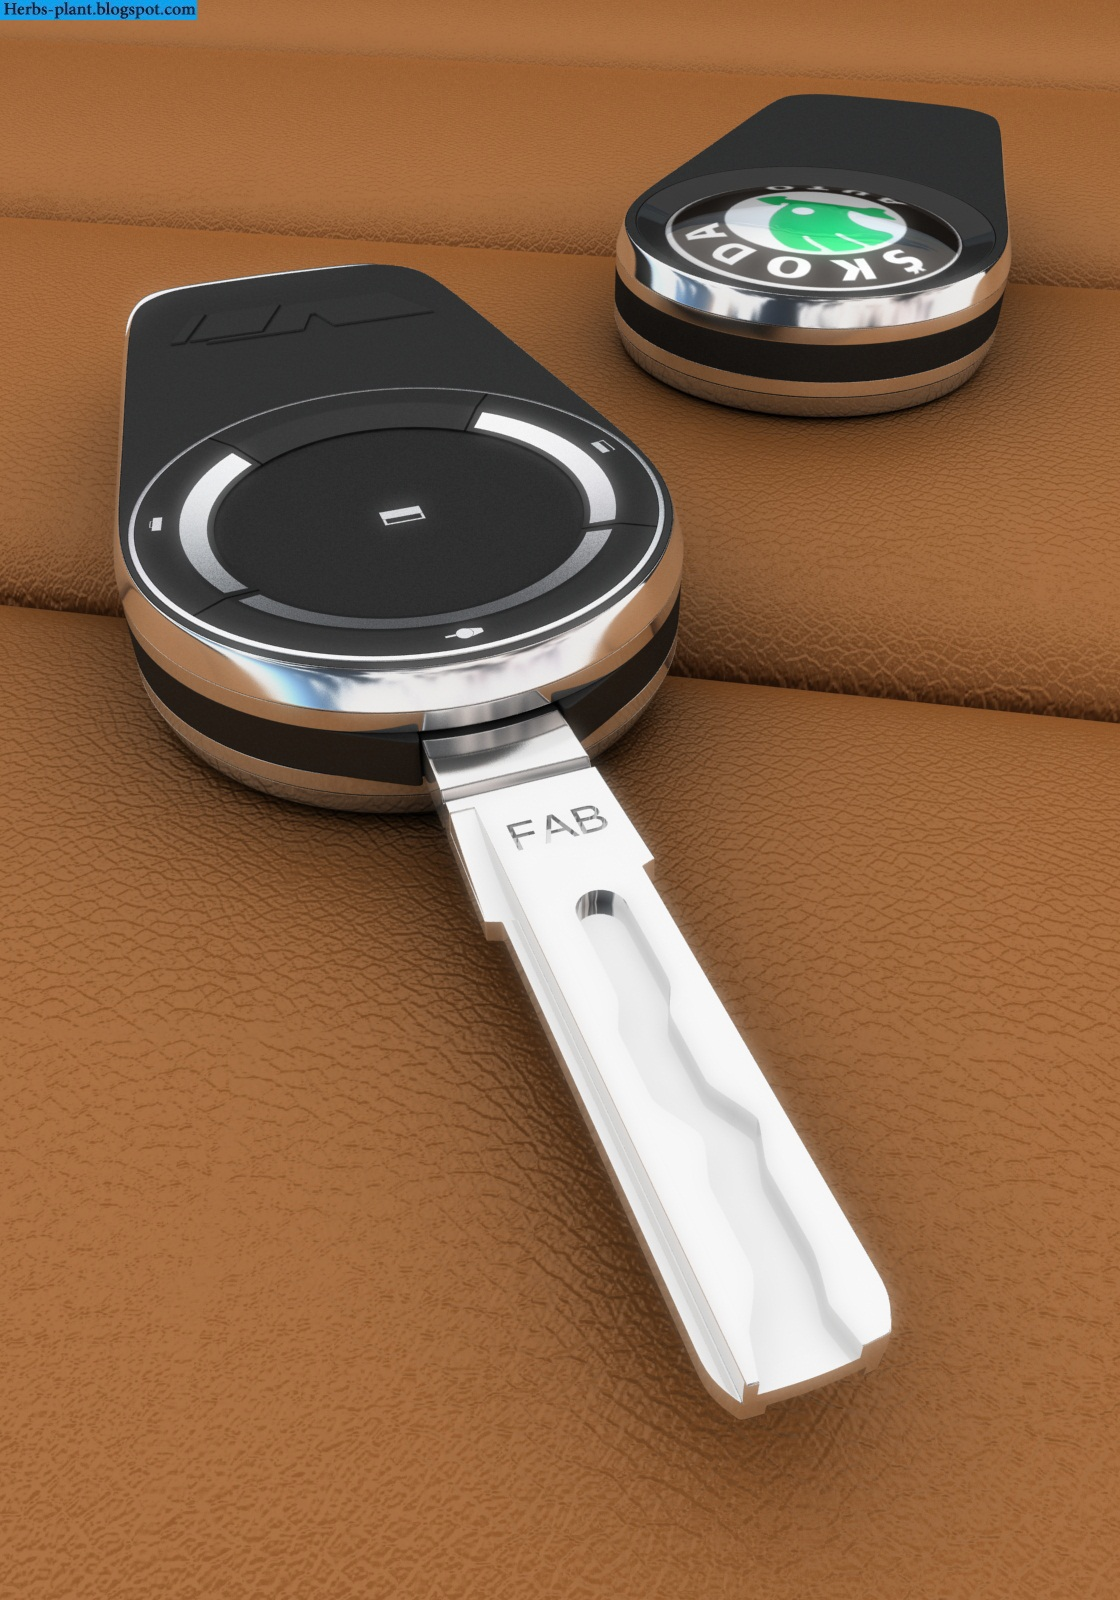 Skoda rapid car 2013 key - صور مفاتيح سيارة سكودا رابيد 2013